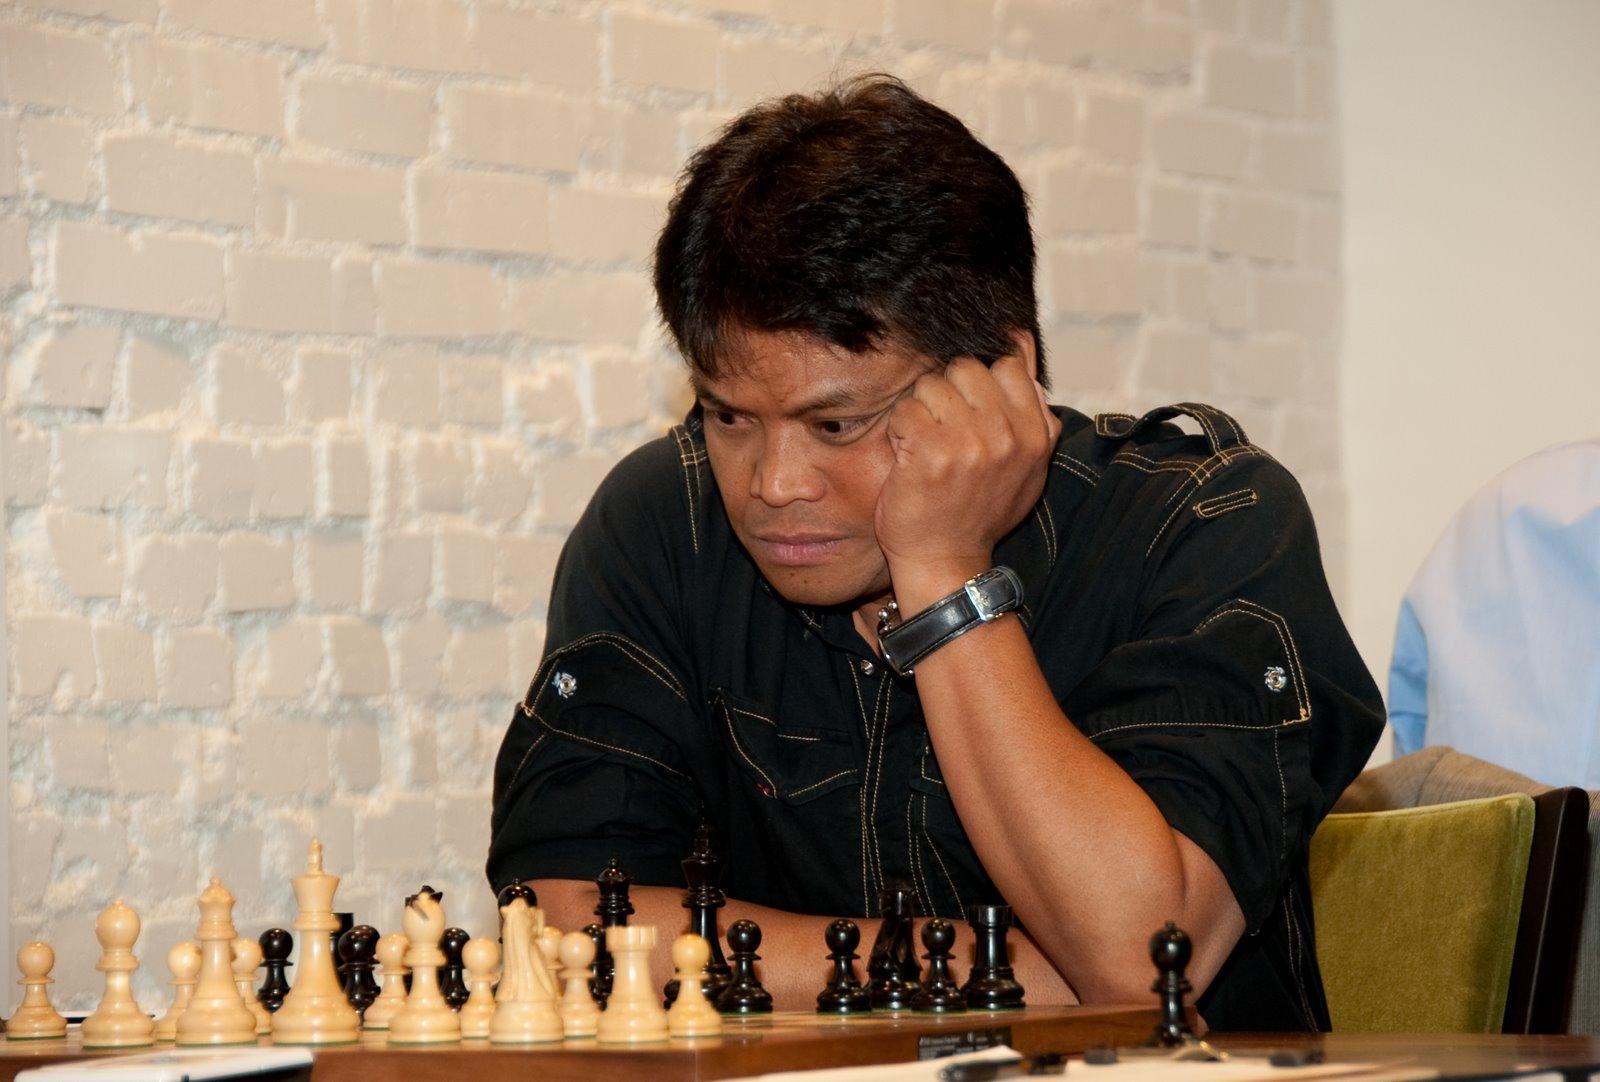 Sevillano, Enrico Round 3 US Champs 2009-49